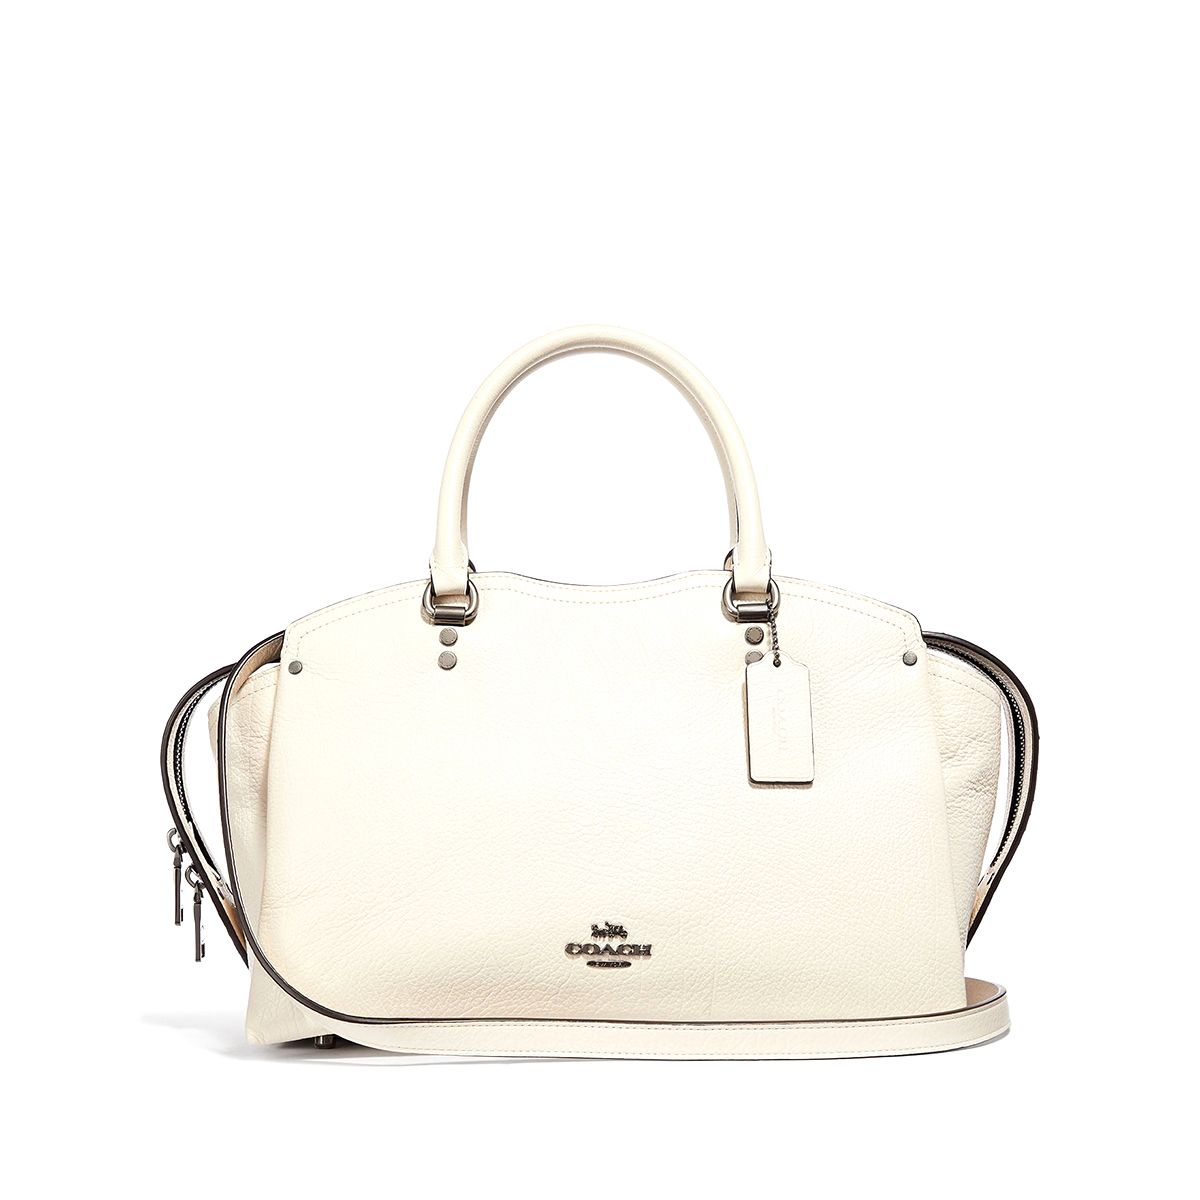 688bb2ccc1e COACH - Designer Handbags   Accessories - Macy s